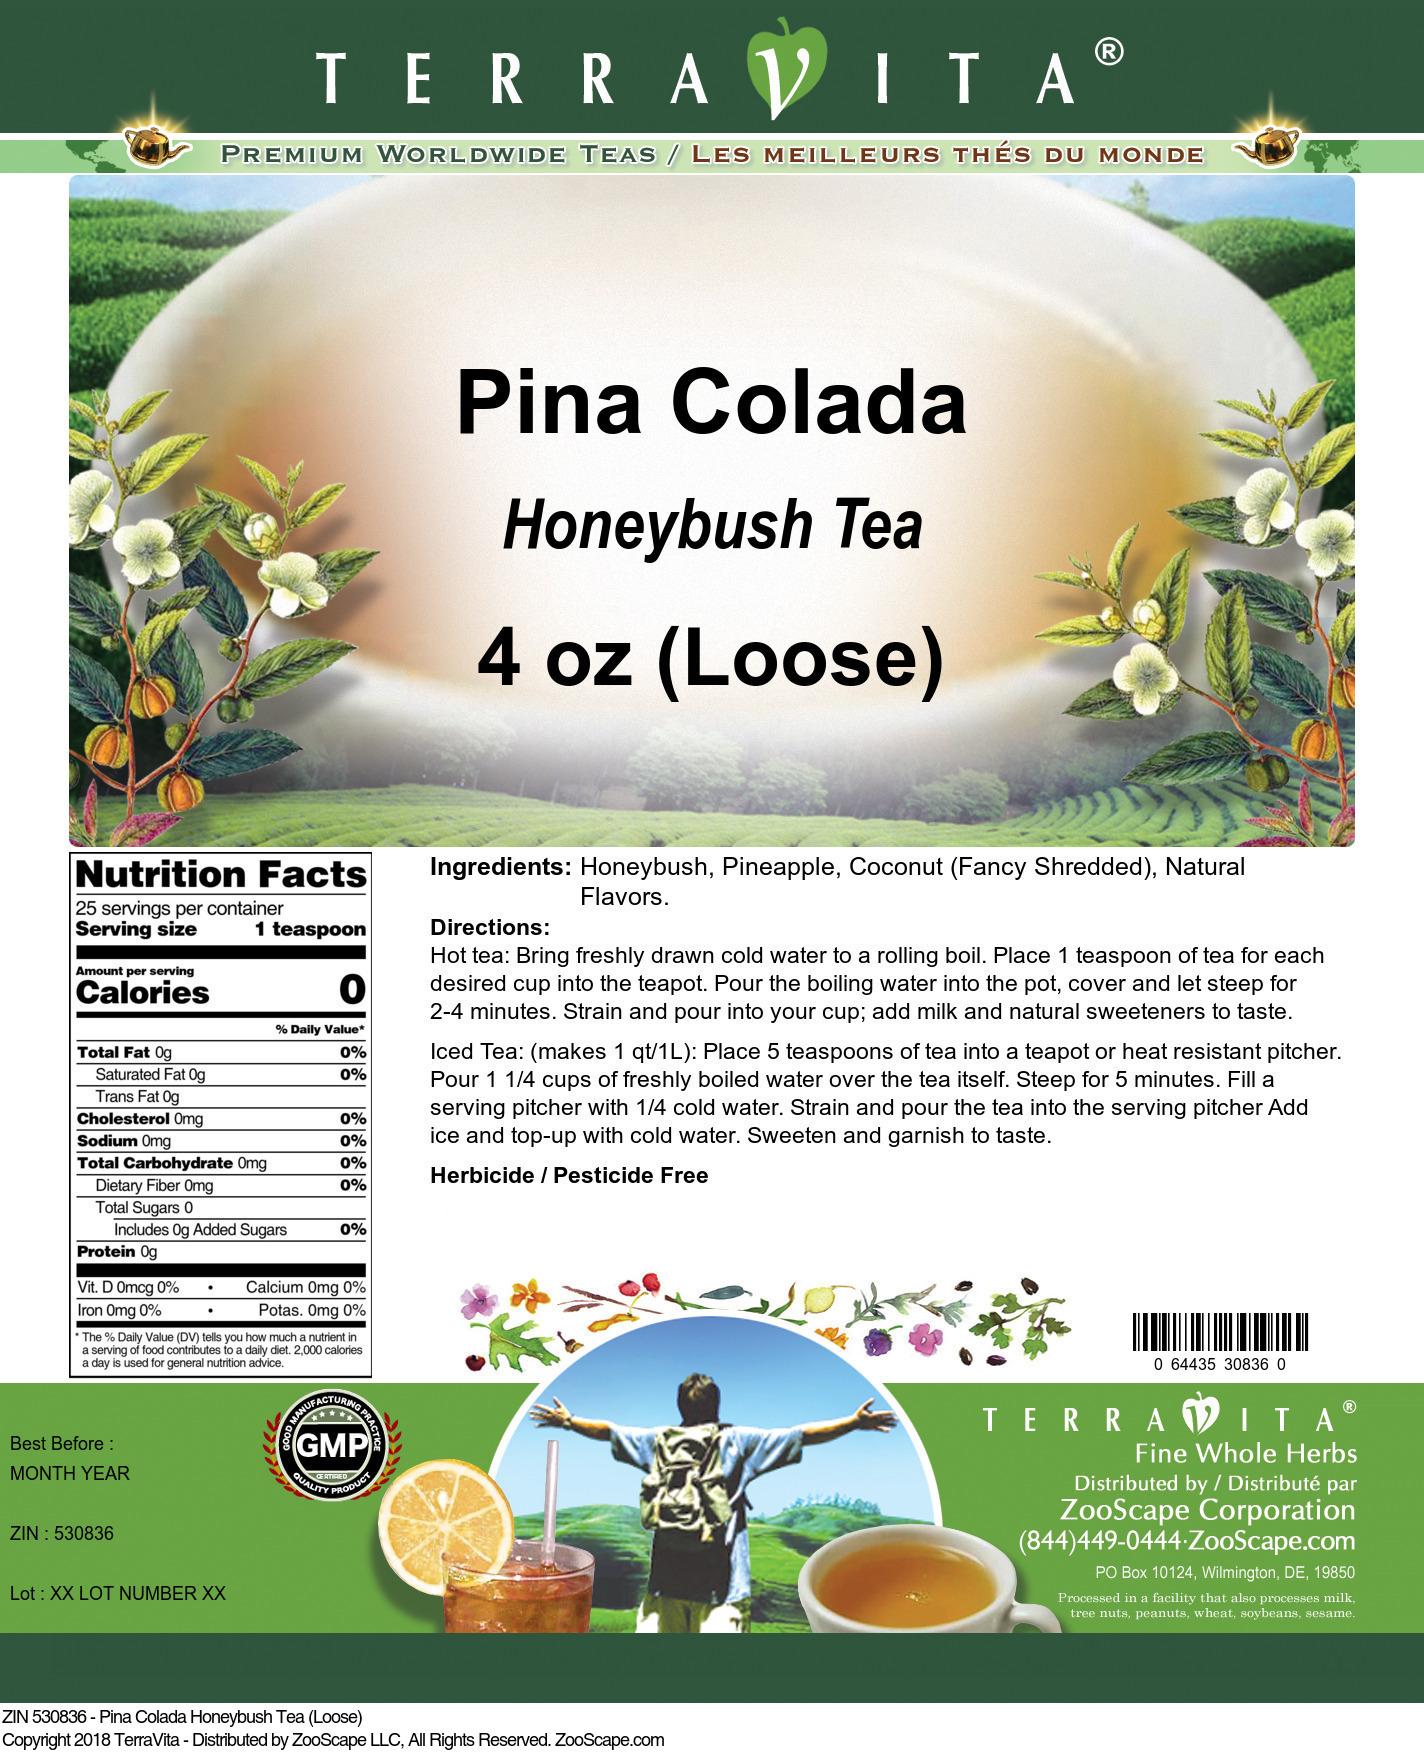 Pina Colada Honeybush Tea